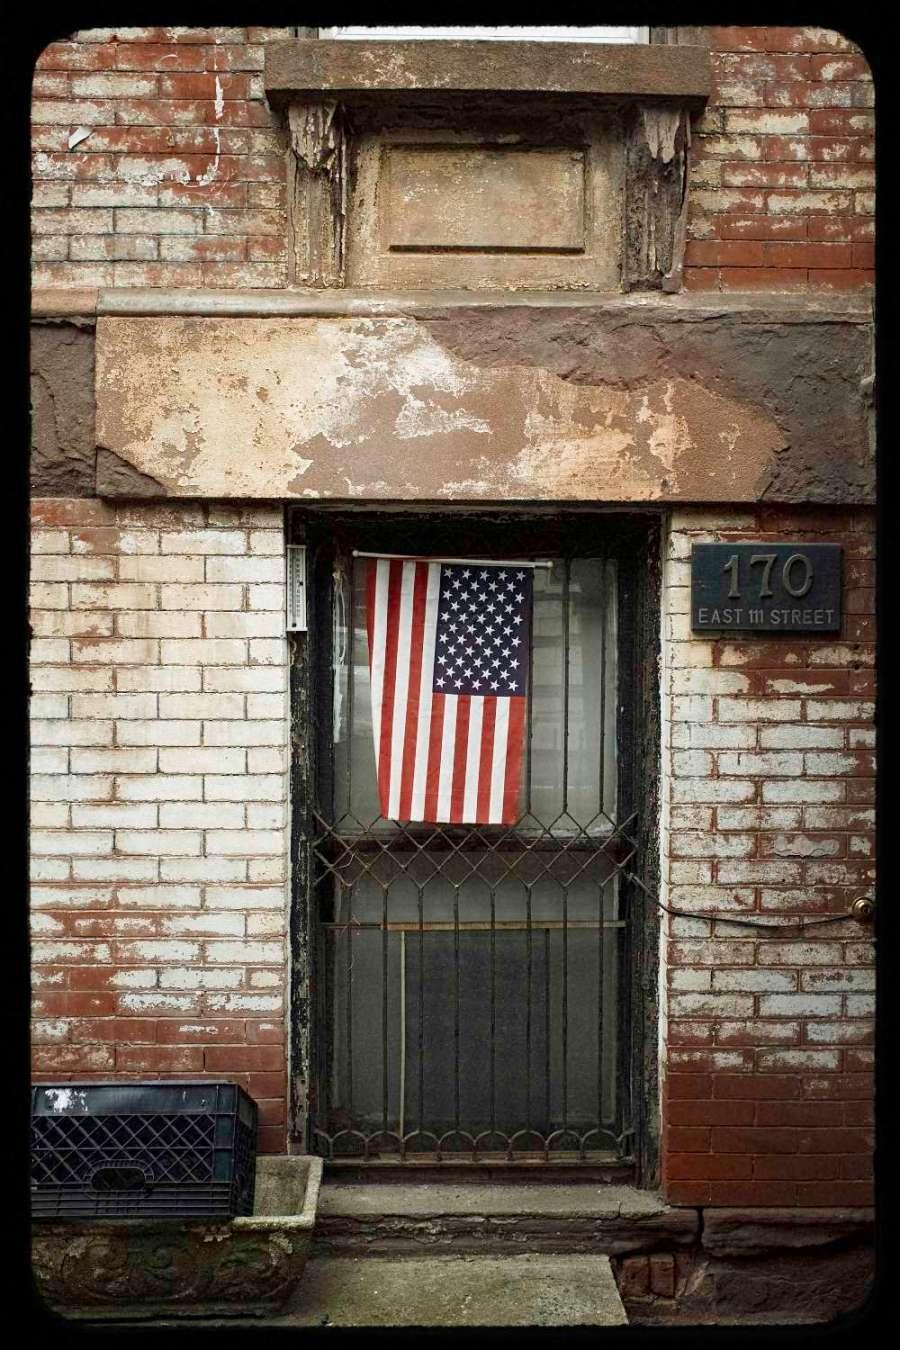 170 East 111th Street